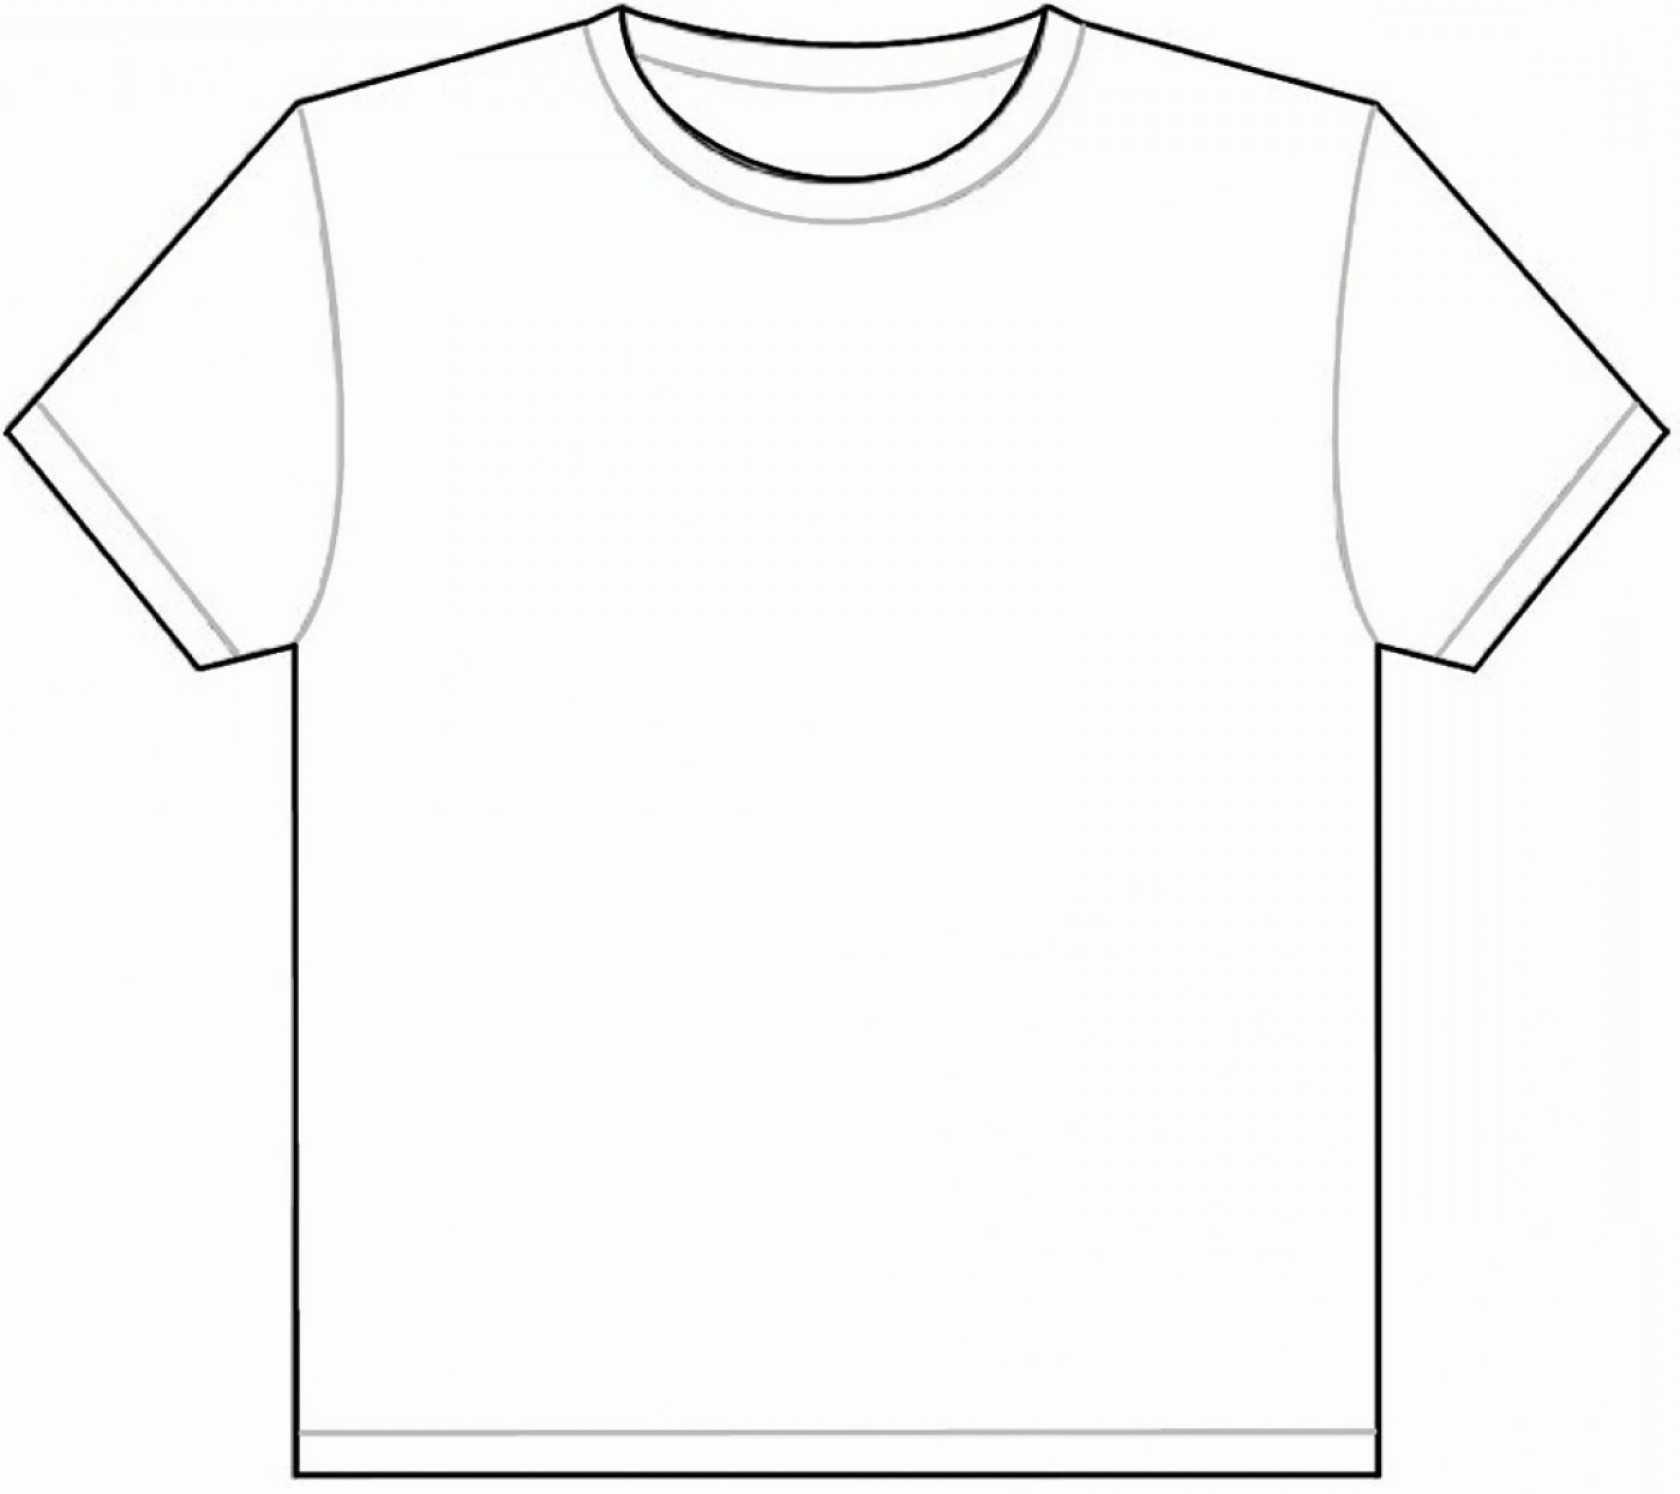 006 Blank Tee Shirt Template T Shirts Vector Beautiful Ideas Intended For Blank Tee Shirt Template